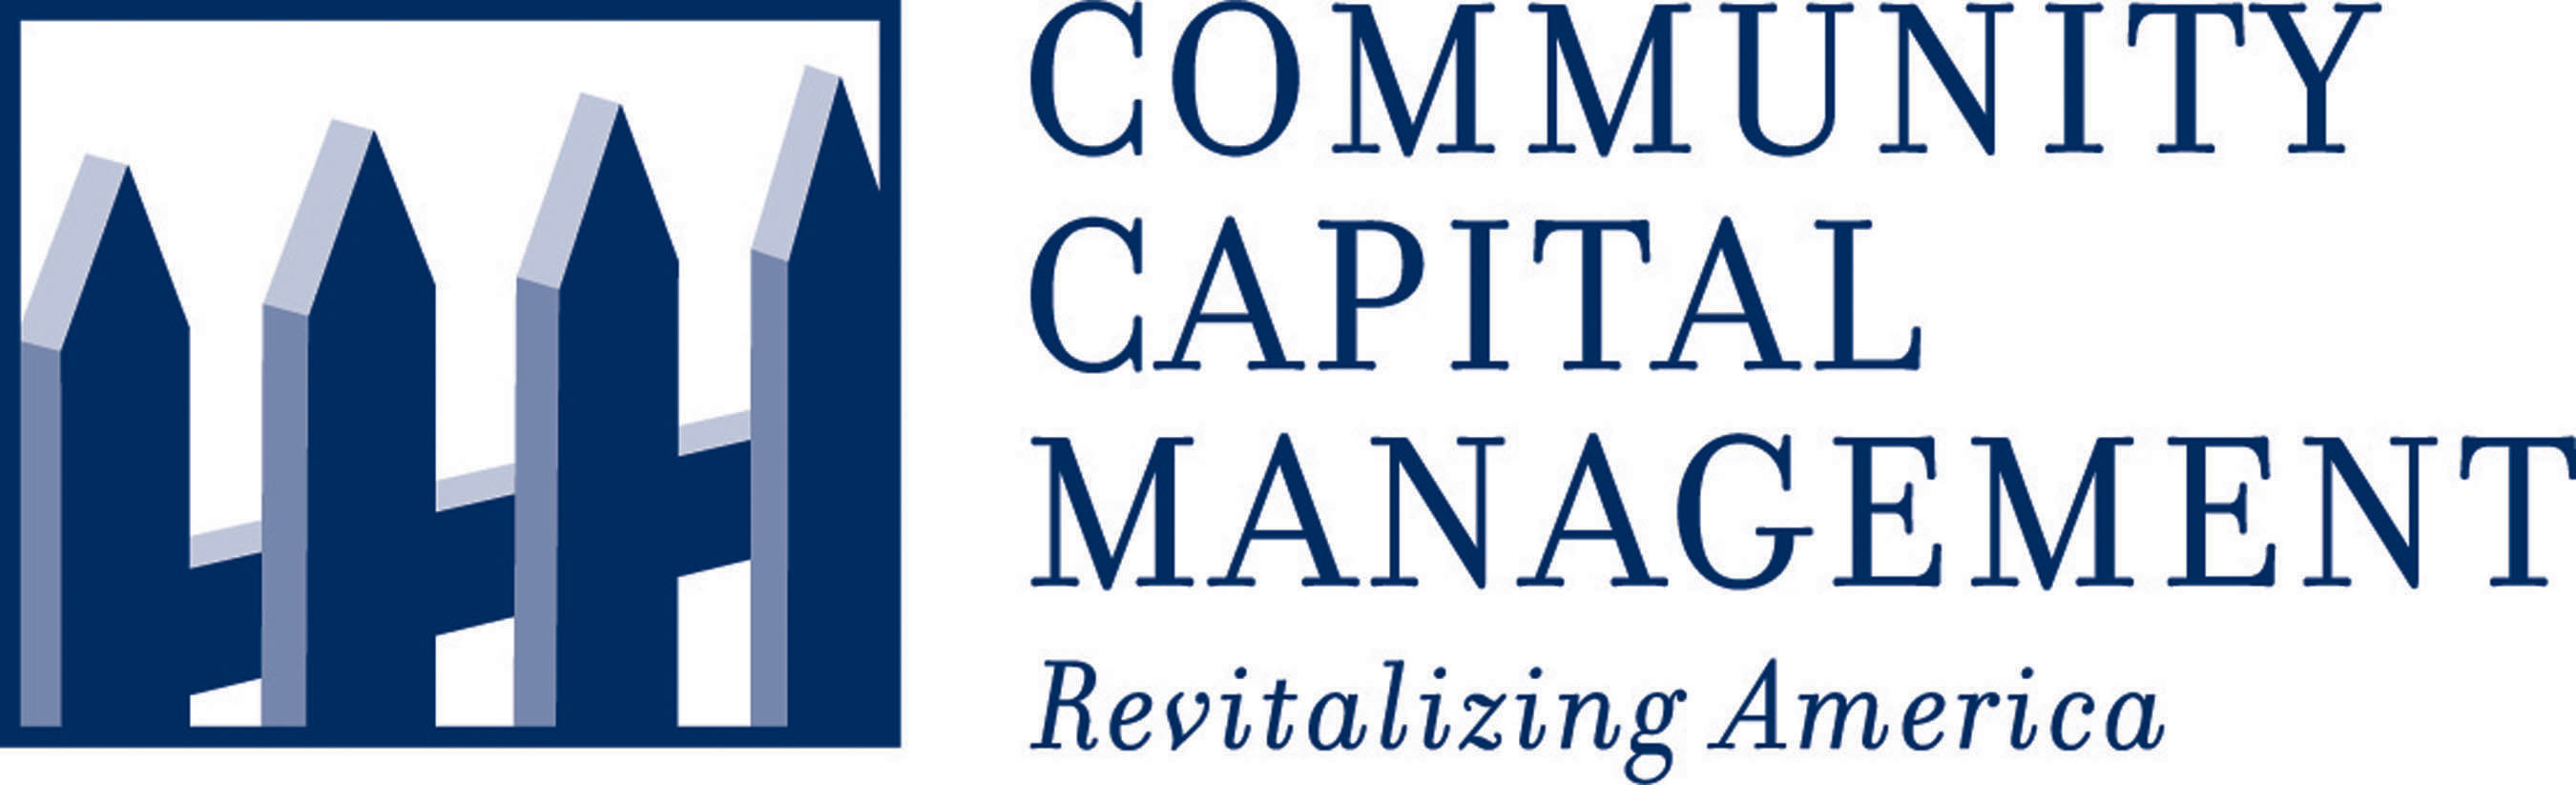 Community Capital Management Logo.